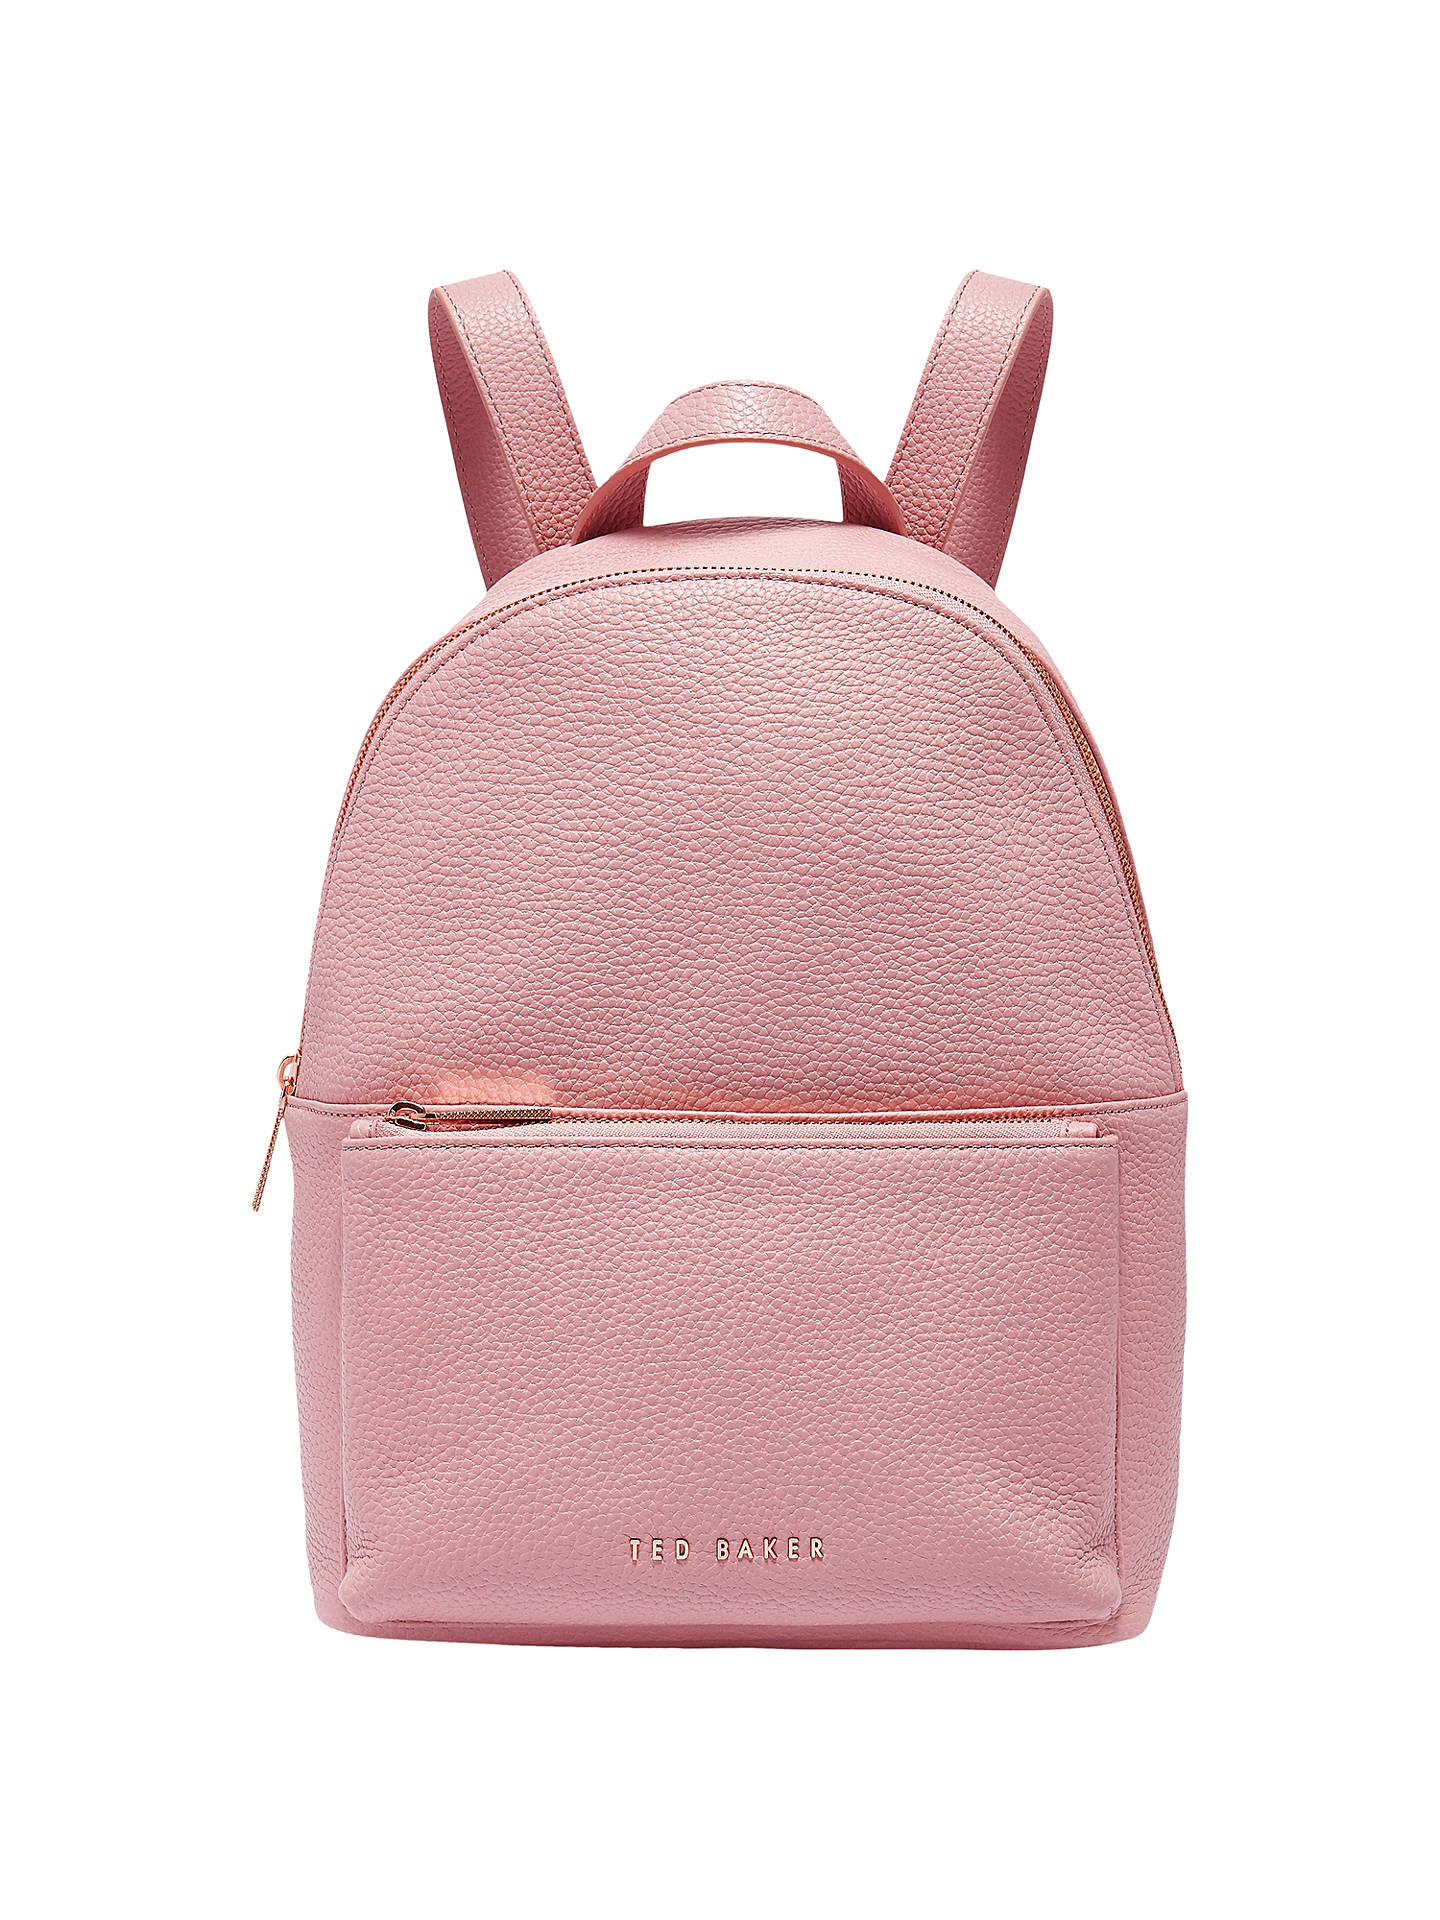 4a3b92cfa Buy Ted Baker Pearen Leather Backpack, Dusky Pink Online at johnlewis.com  ...